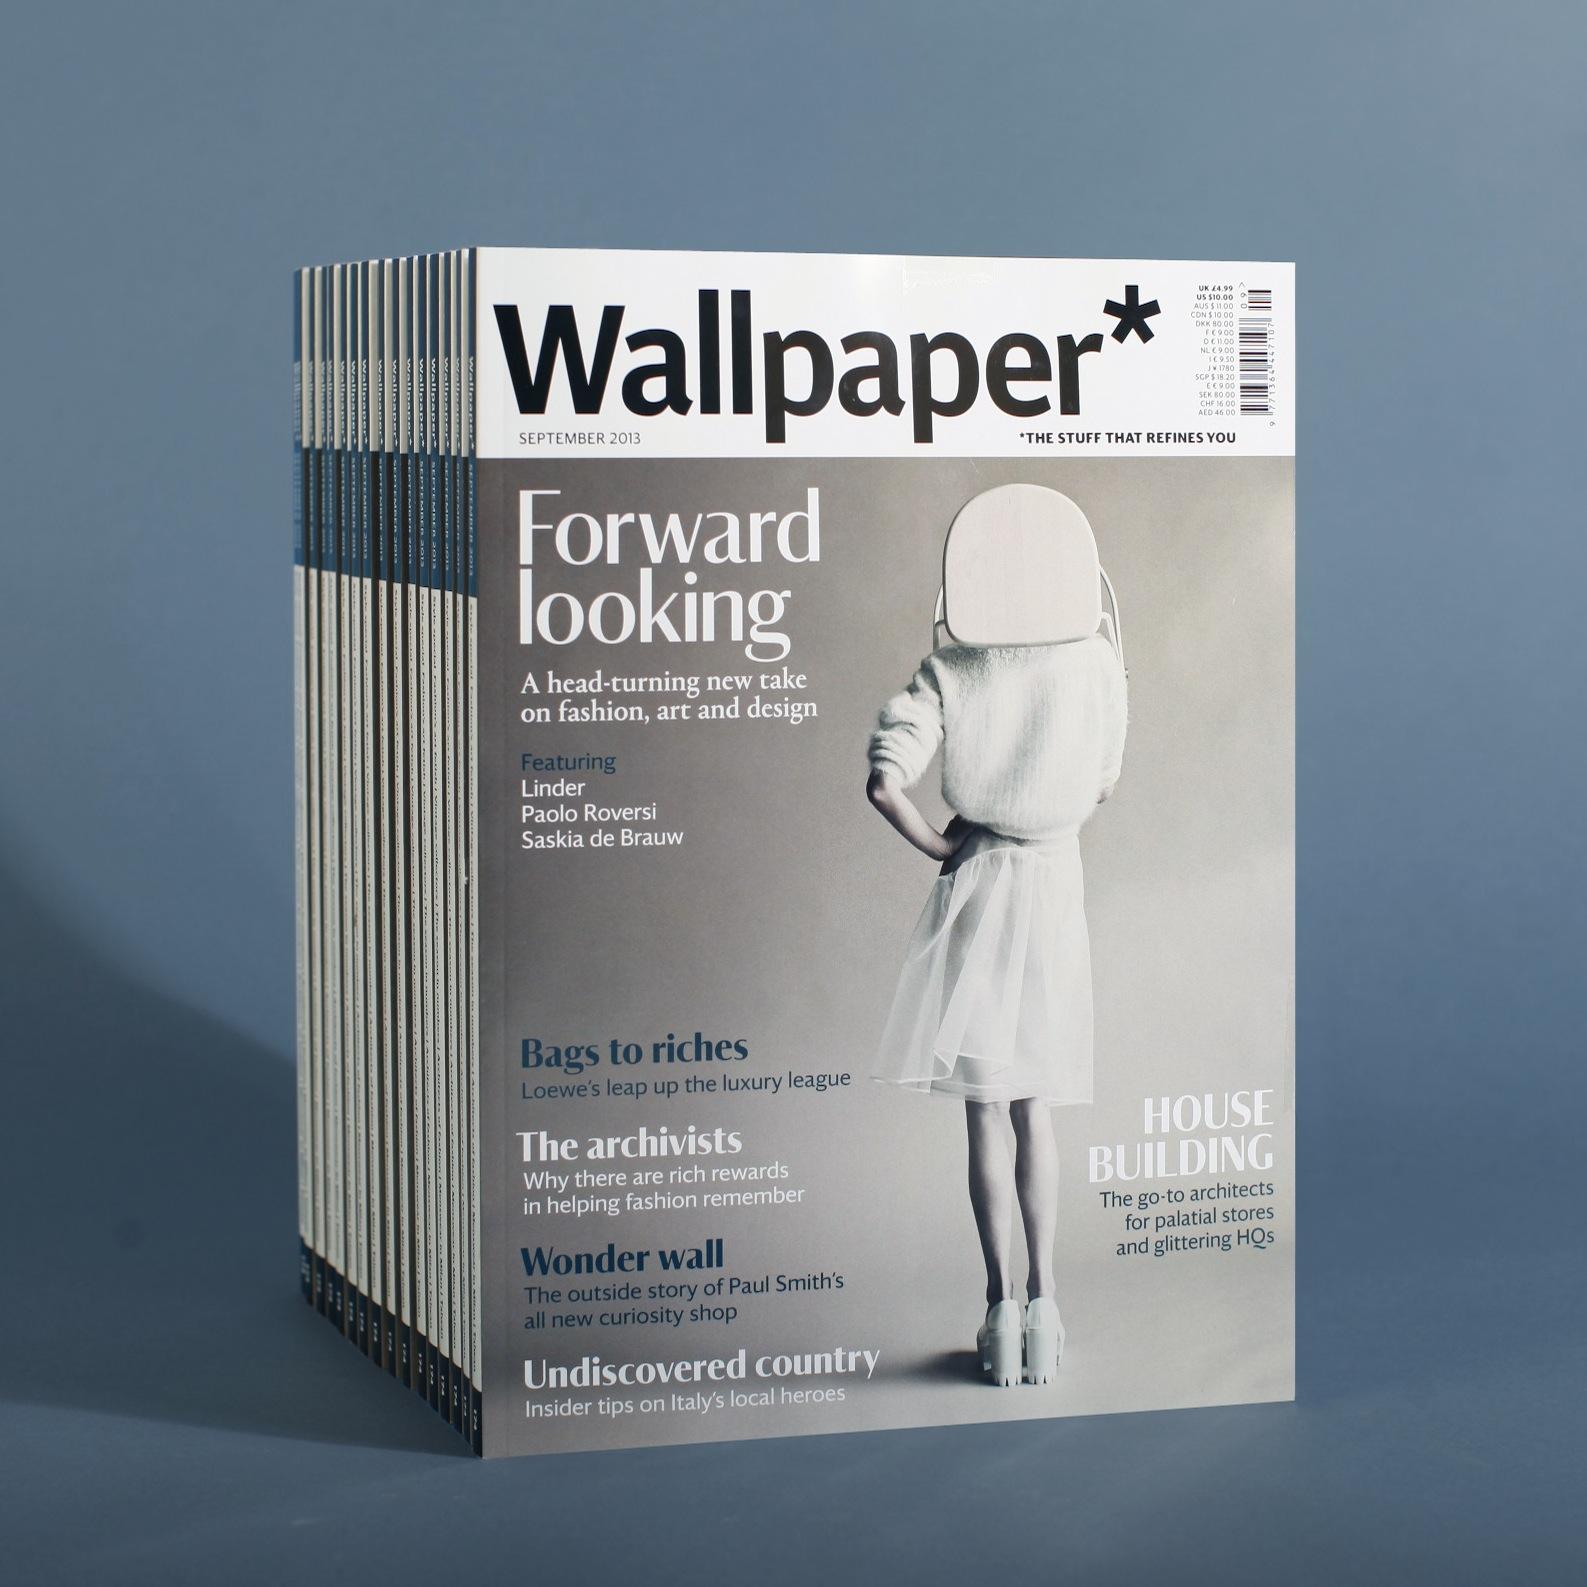 wallpaper-redesign-03